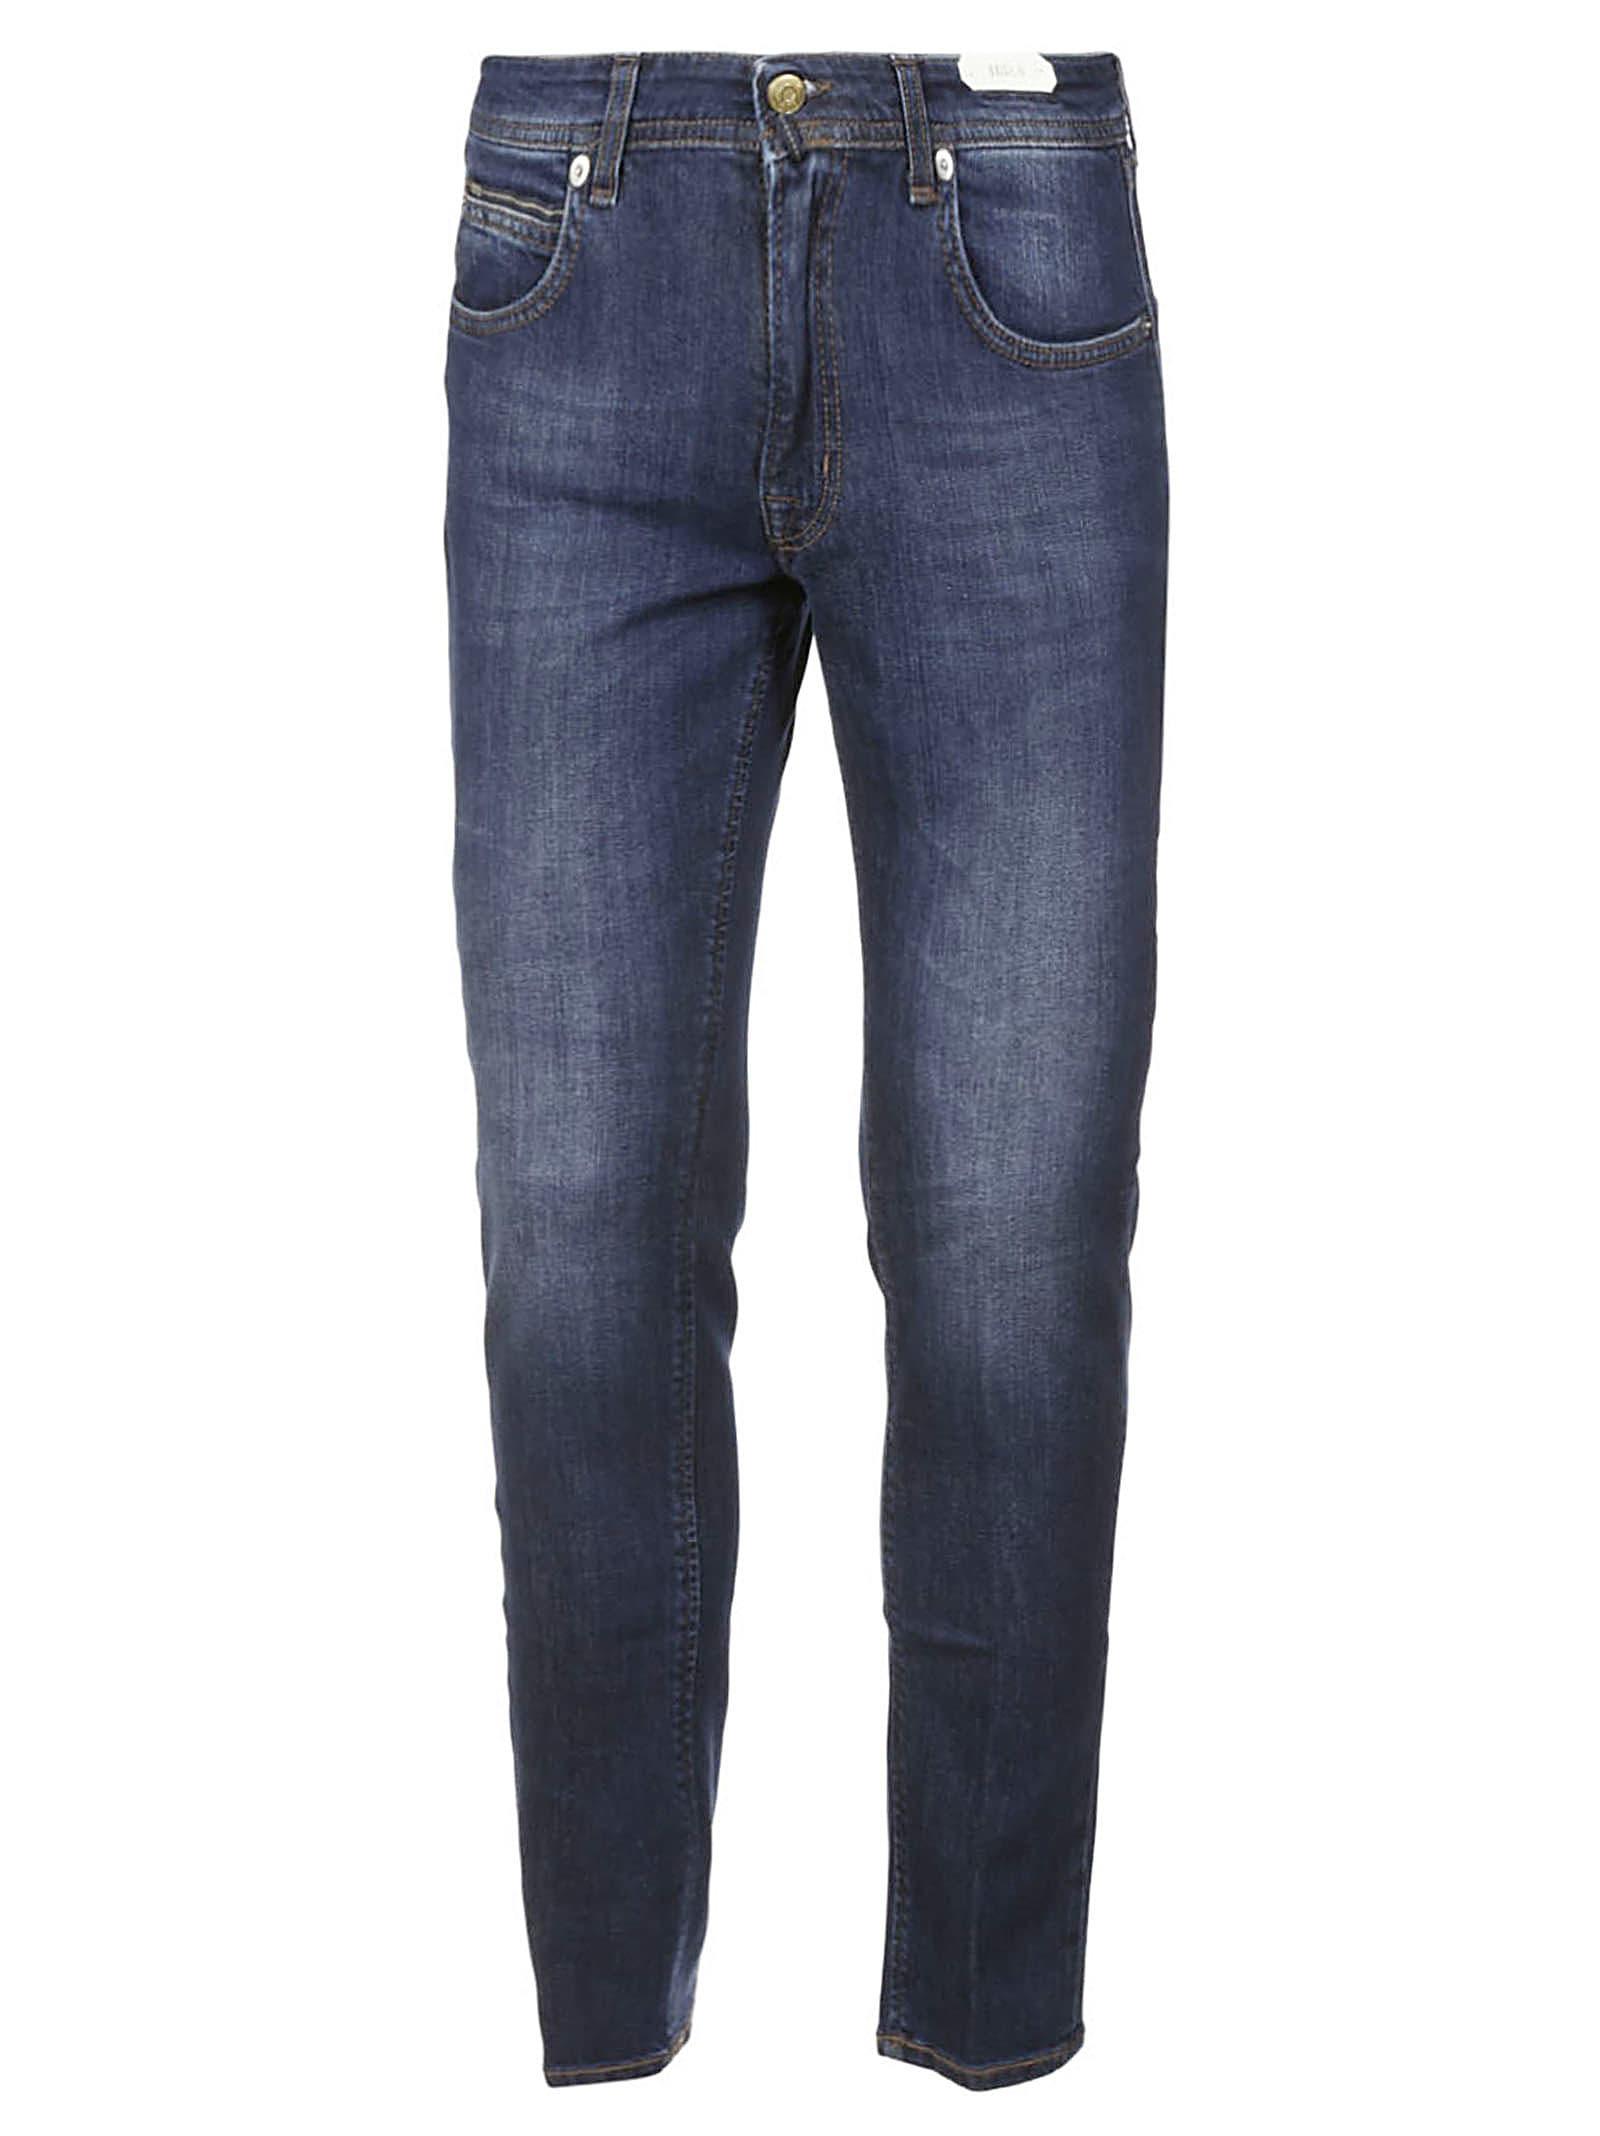 1949 Ribot Jeans